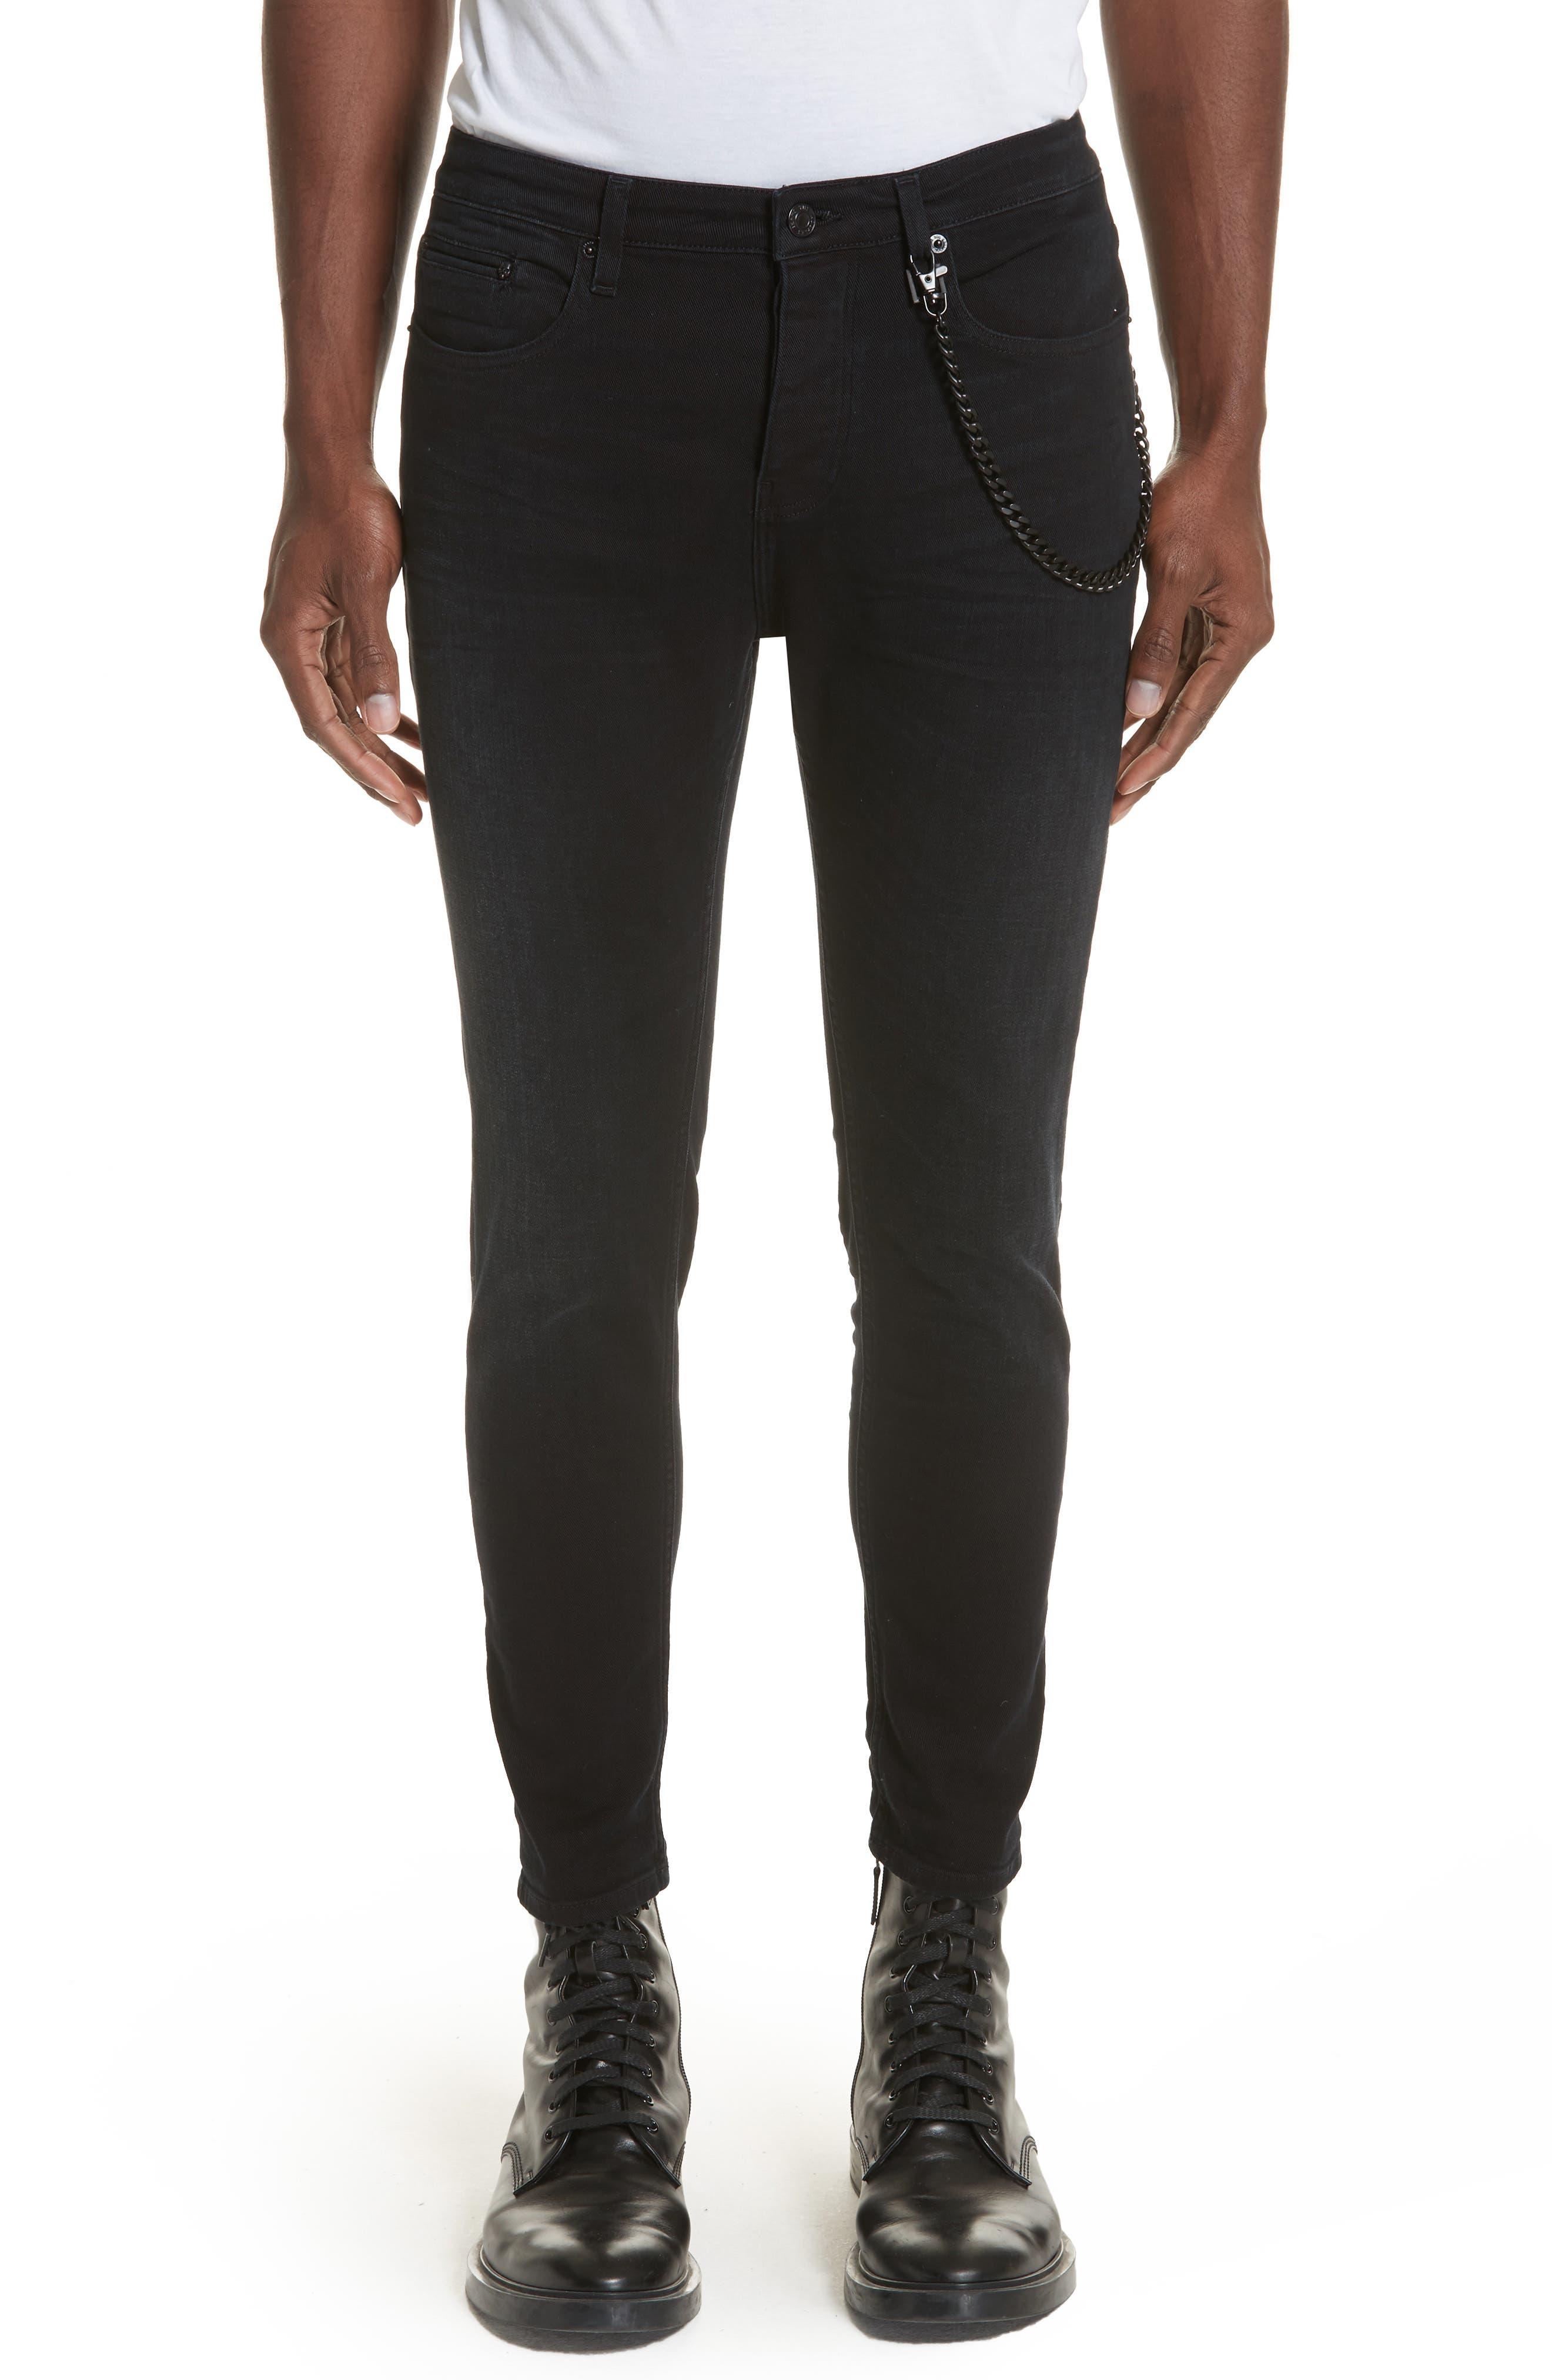 The Kooples Skinny Fit Jeans